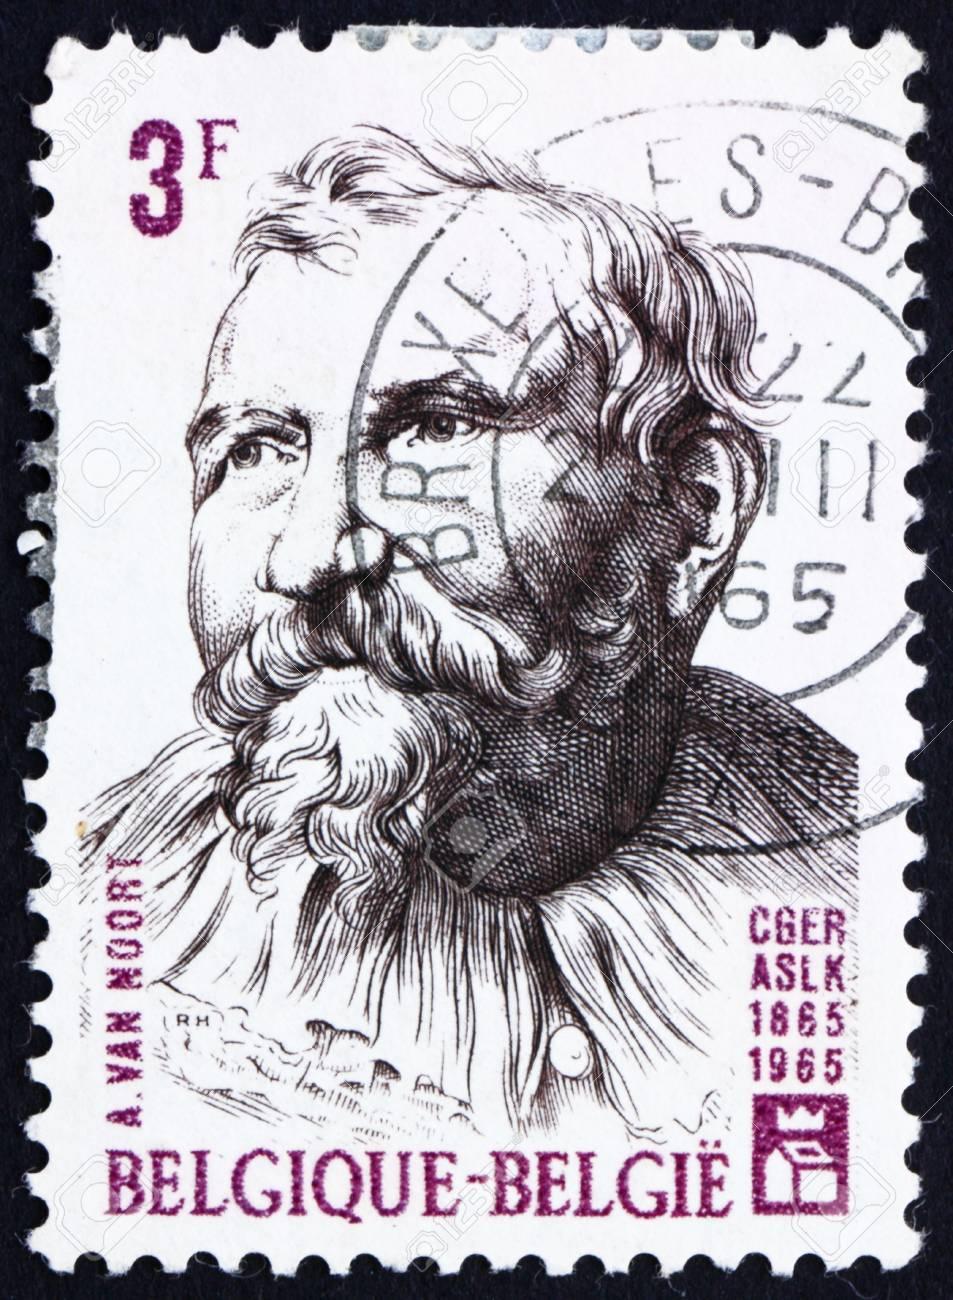 BELGIUM - CIRCA 1965: a stamp printed in the Belgium shows Adam van Noort, Flemish Painter and Draughtsman, circa 1965 Stock Photo - 12935938